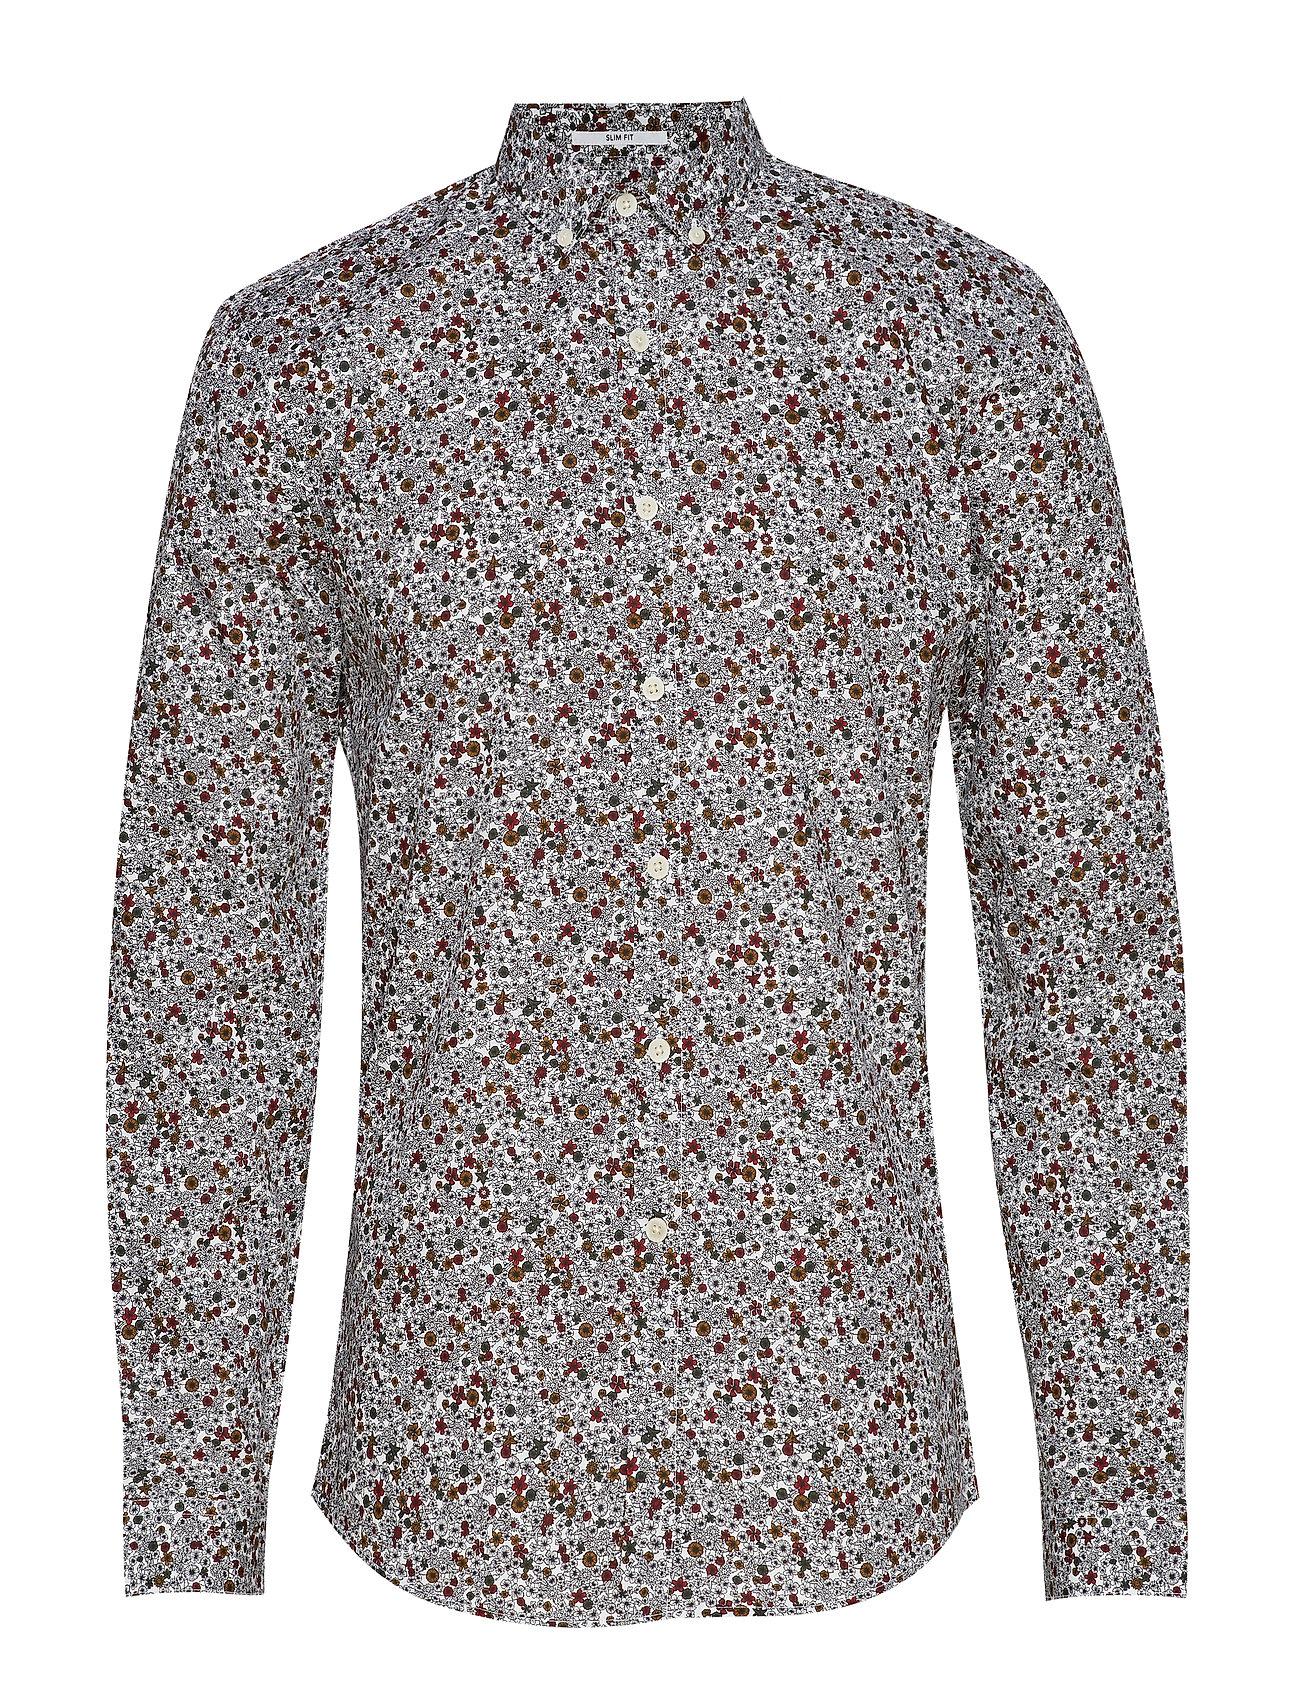 Lindbergh Ditsy floral print shirt L/S - WHITE